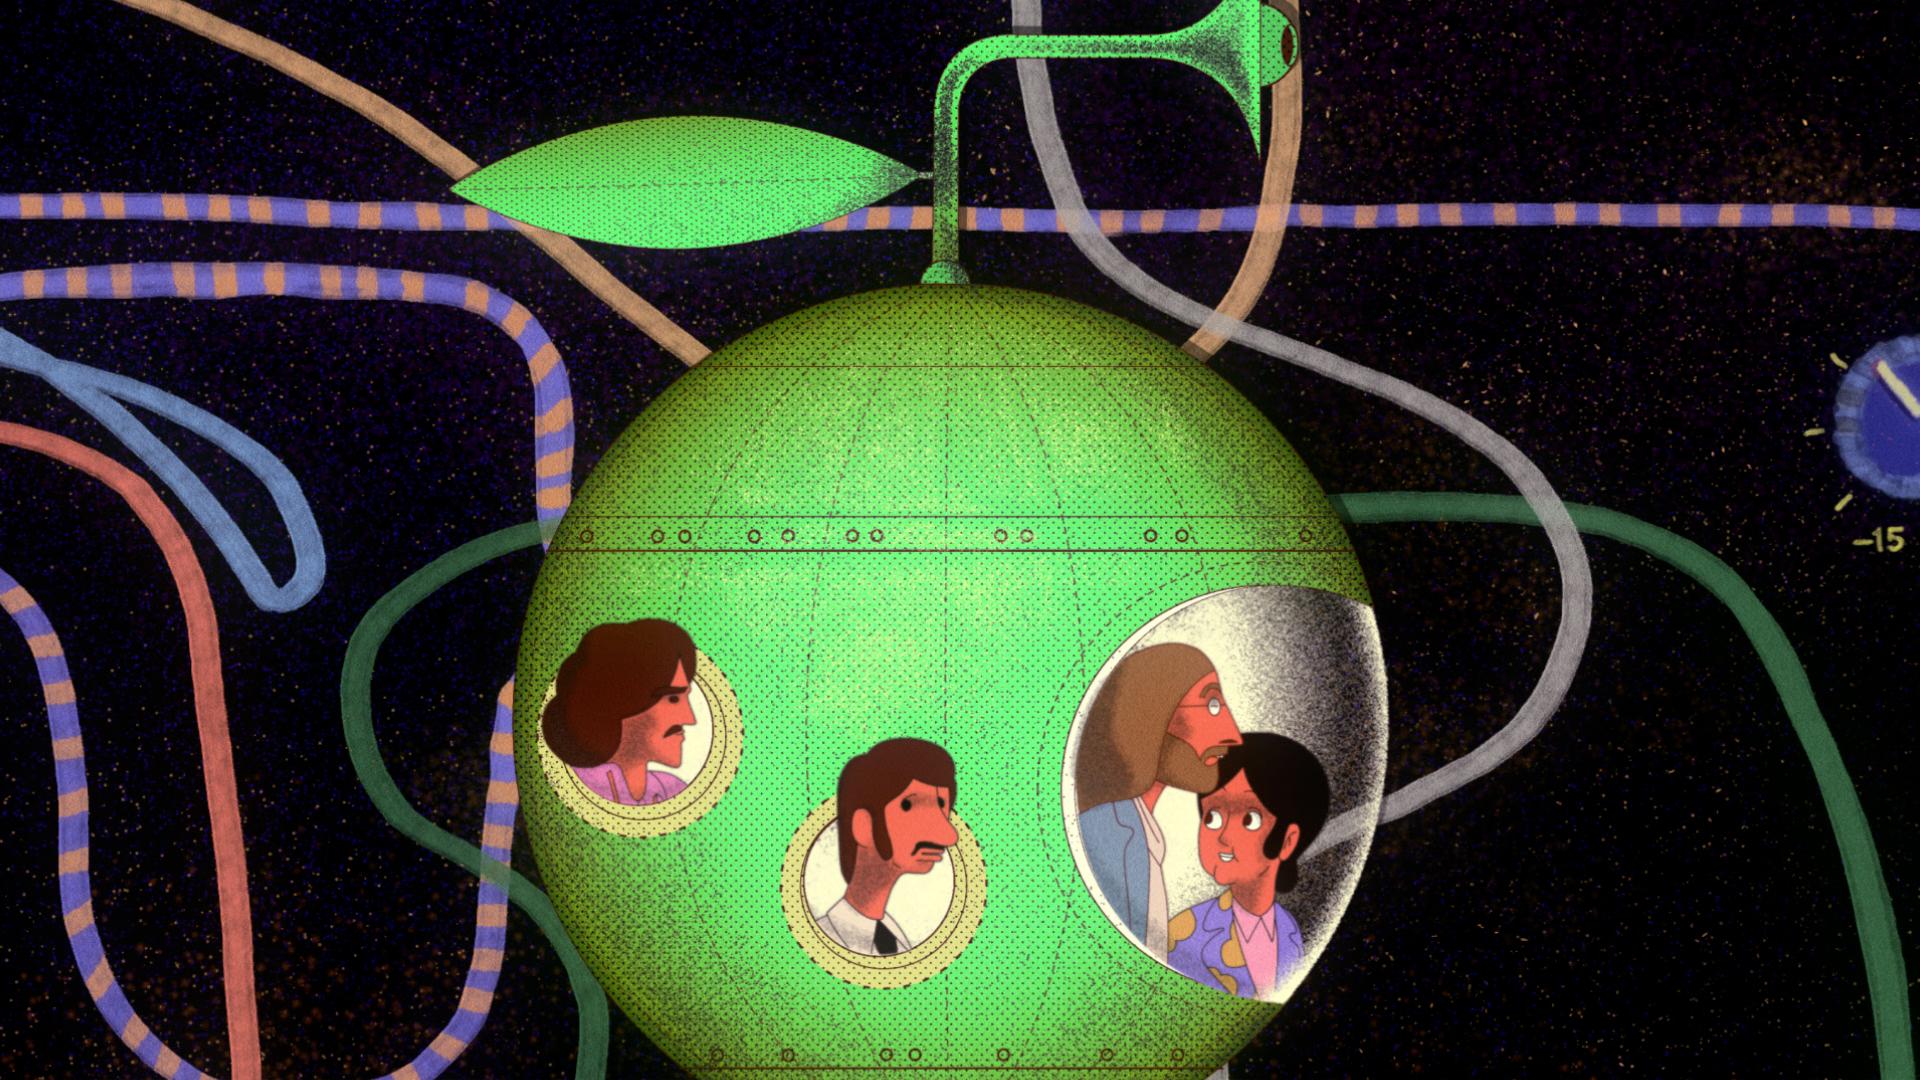 Beatles_Apple_Still_CREDIT_FONS_SCHIEDON_0021__ 26.jpg